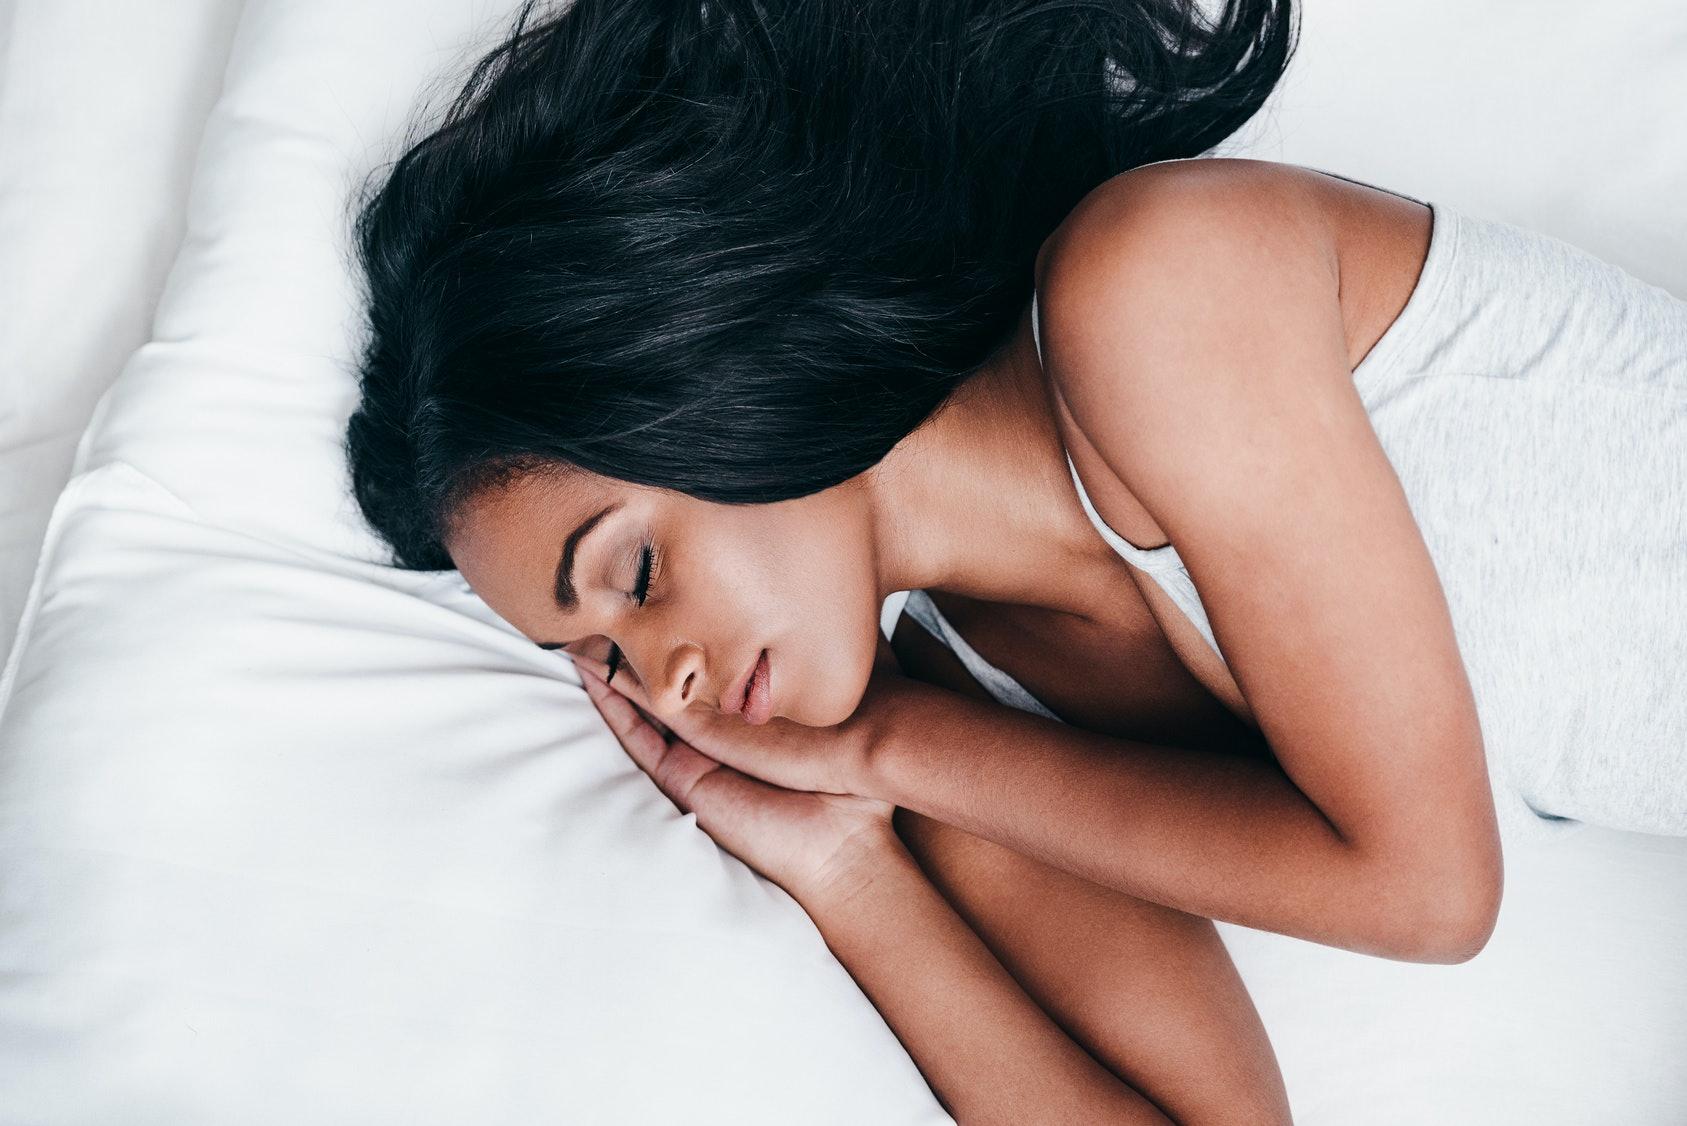 Girl Orgasm Sleep Phase Rem